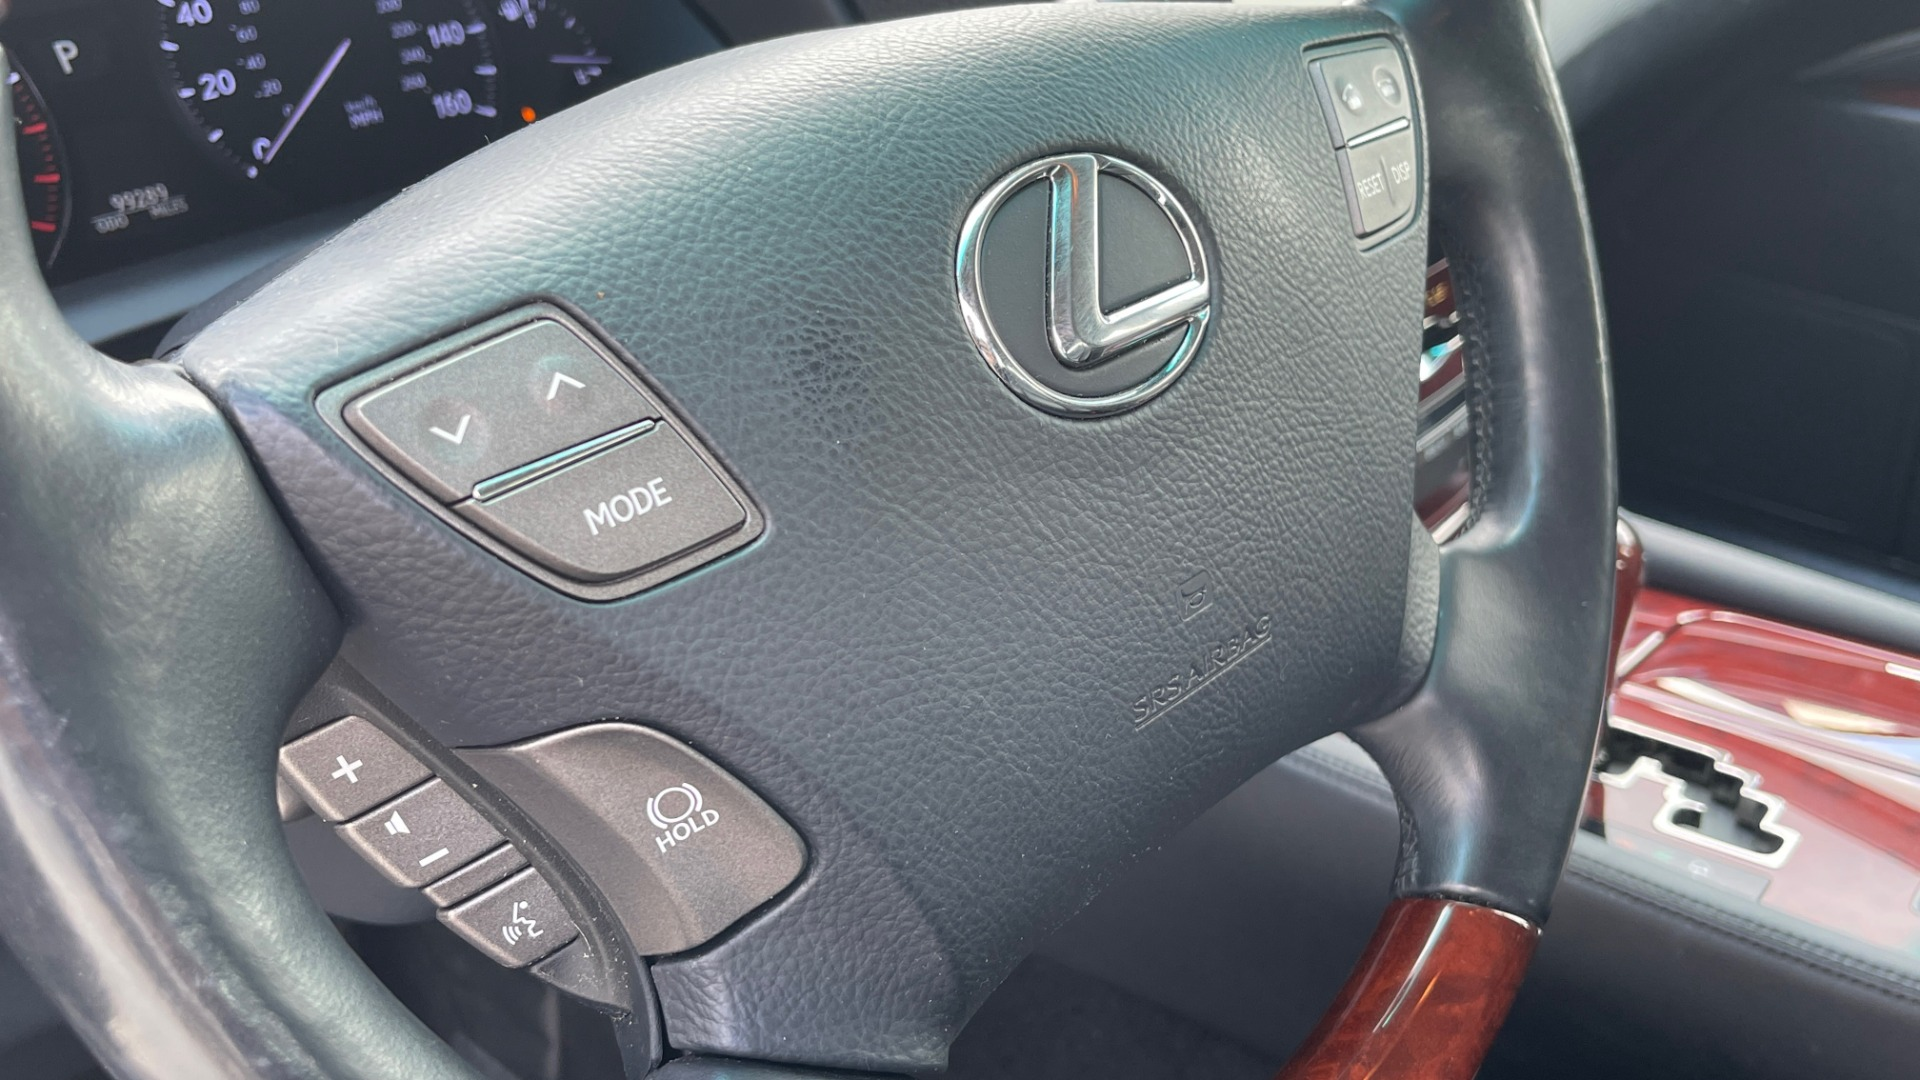 Used 2007 Lexus LS 460 SEDAN / COMFORT PKG / NAVIGATION / MARK LEVINSON / REARVIEW for sale $14,995 at Formula Imports in Charlotte NC 28227 34